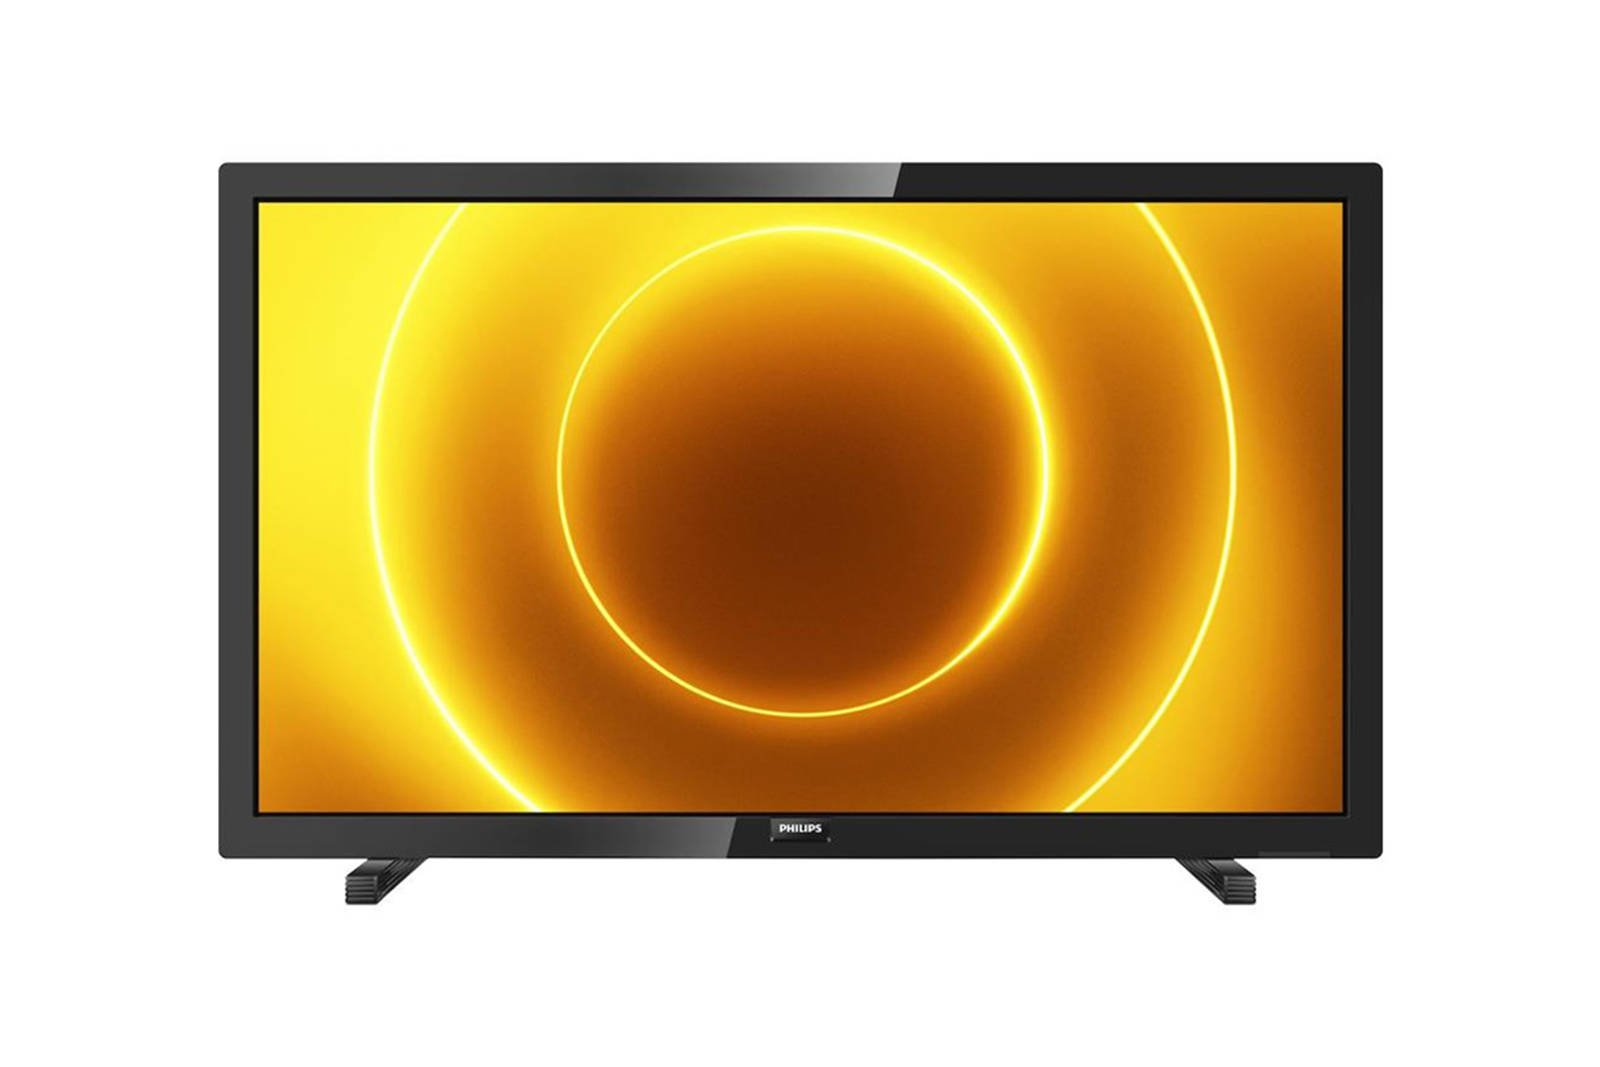 "LED TV Philips 24PFS5505/12 24"" Full HD"